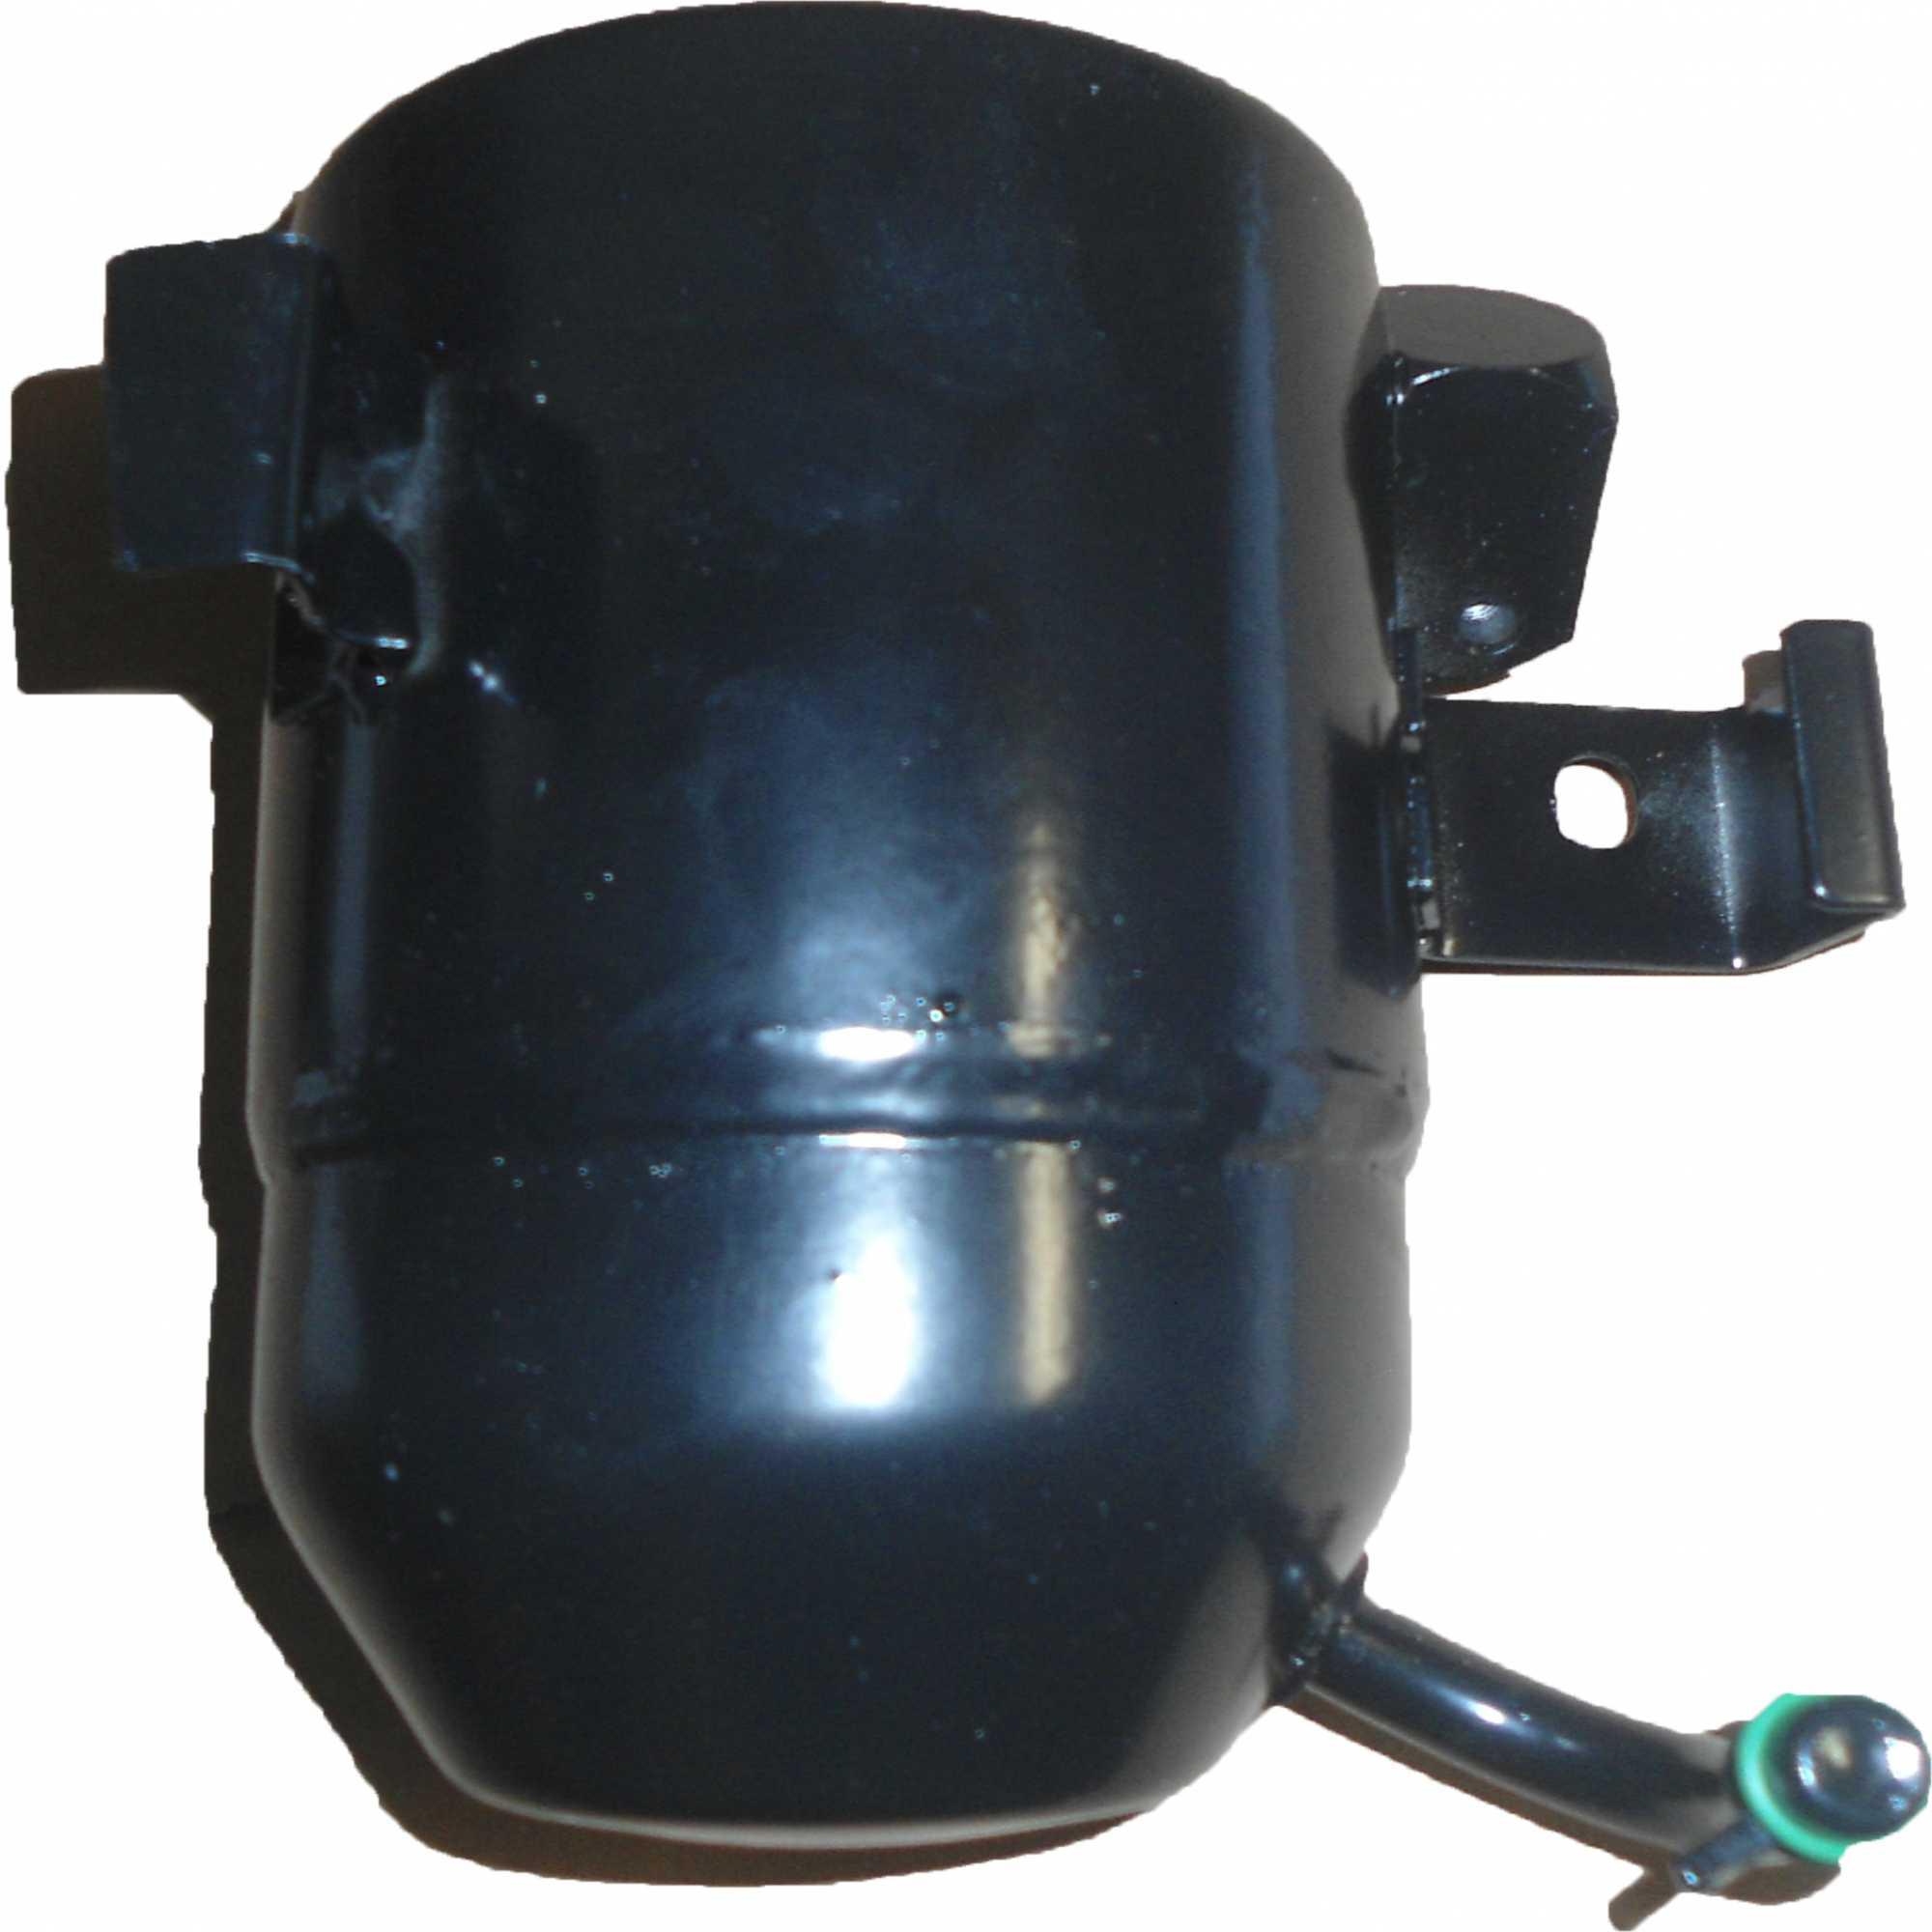 Motor Caixa Evaporadora John Deere Colhedeira 3510/3520/3522 Actecmax